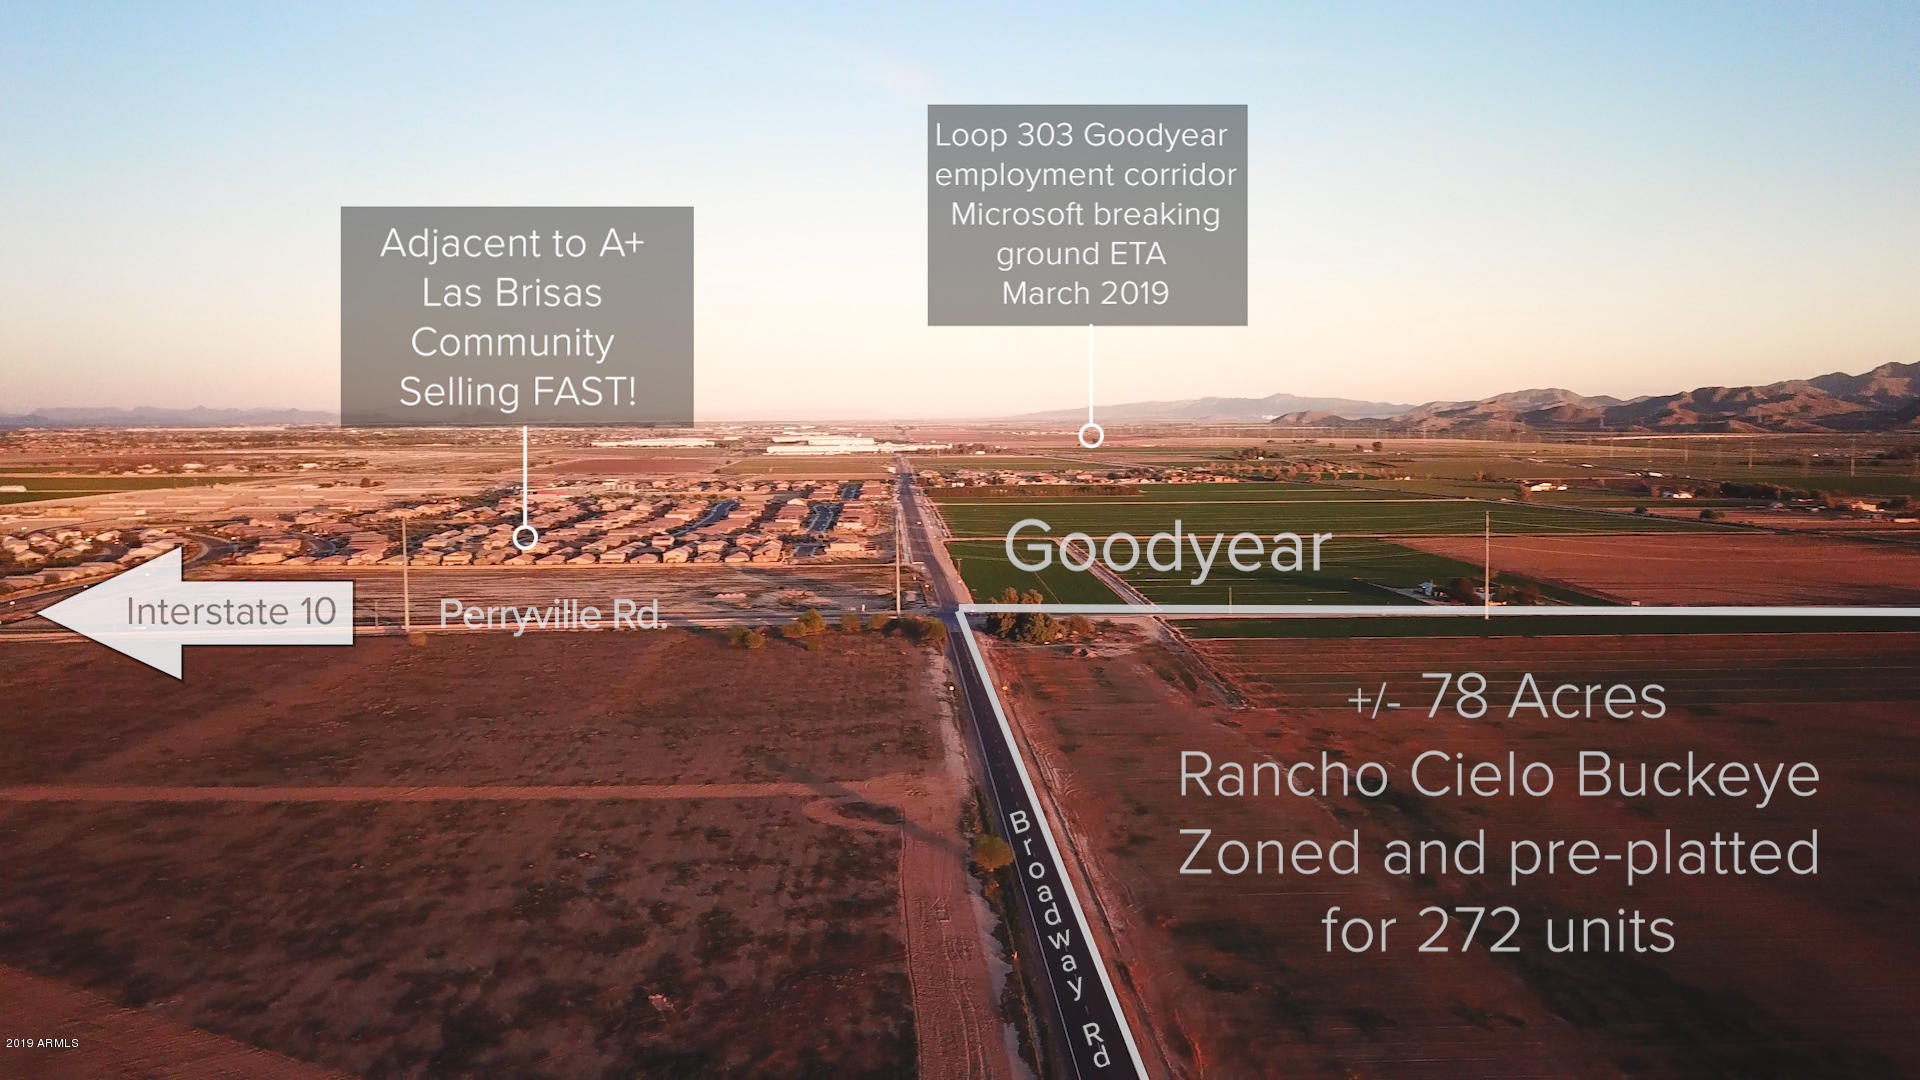 Map Of Loop 303 Arizona.0 Broadway Rd Perryville Rd Buckeye Az 85326 The Cactus Team